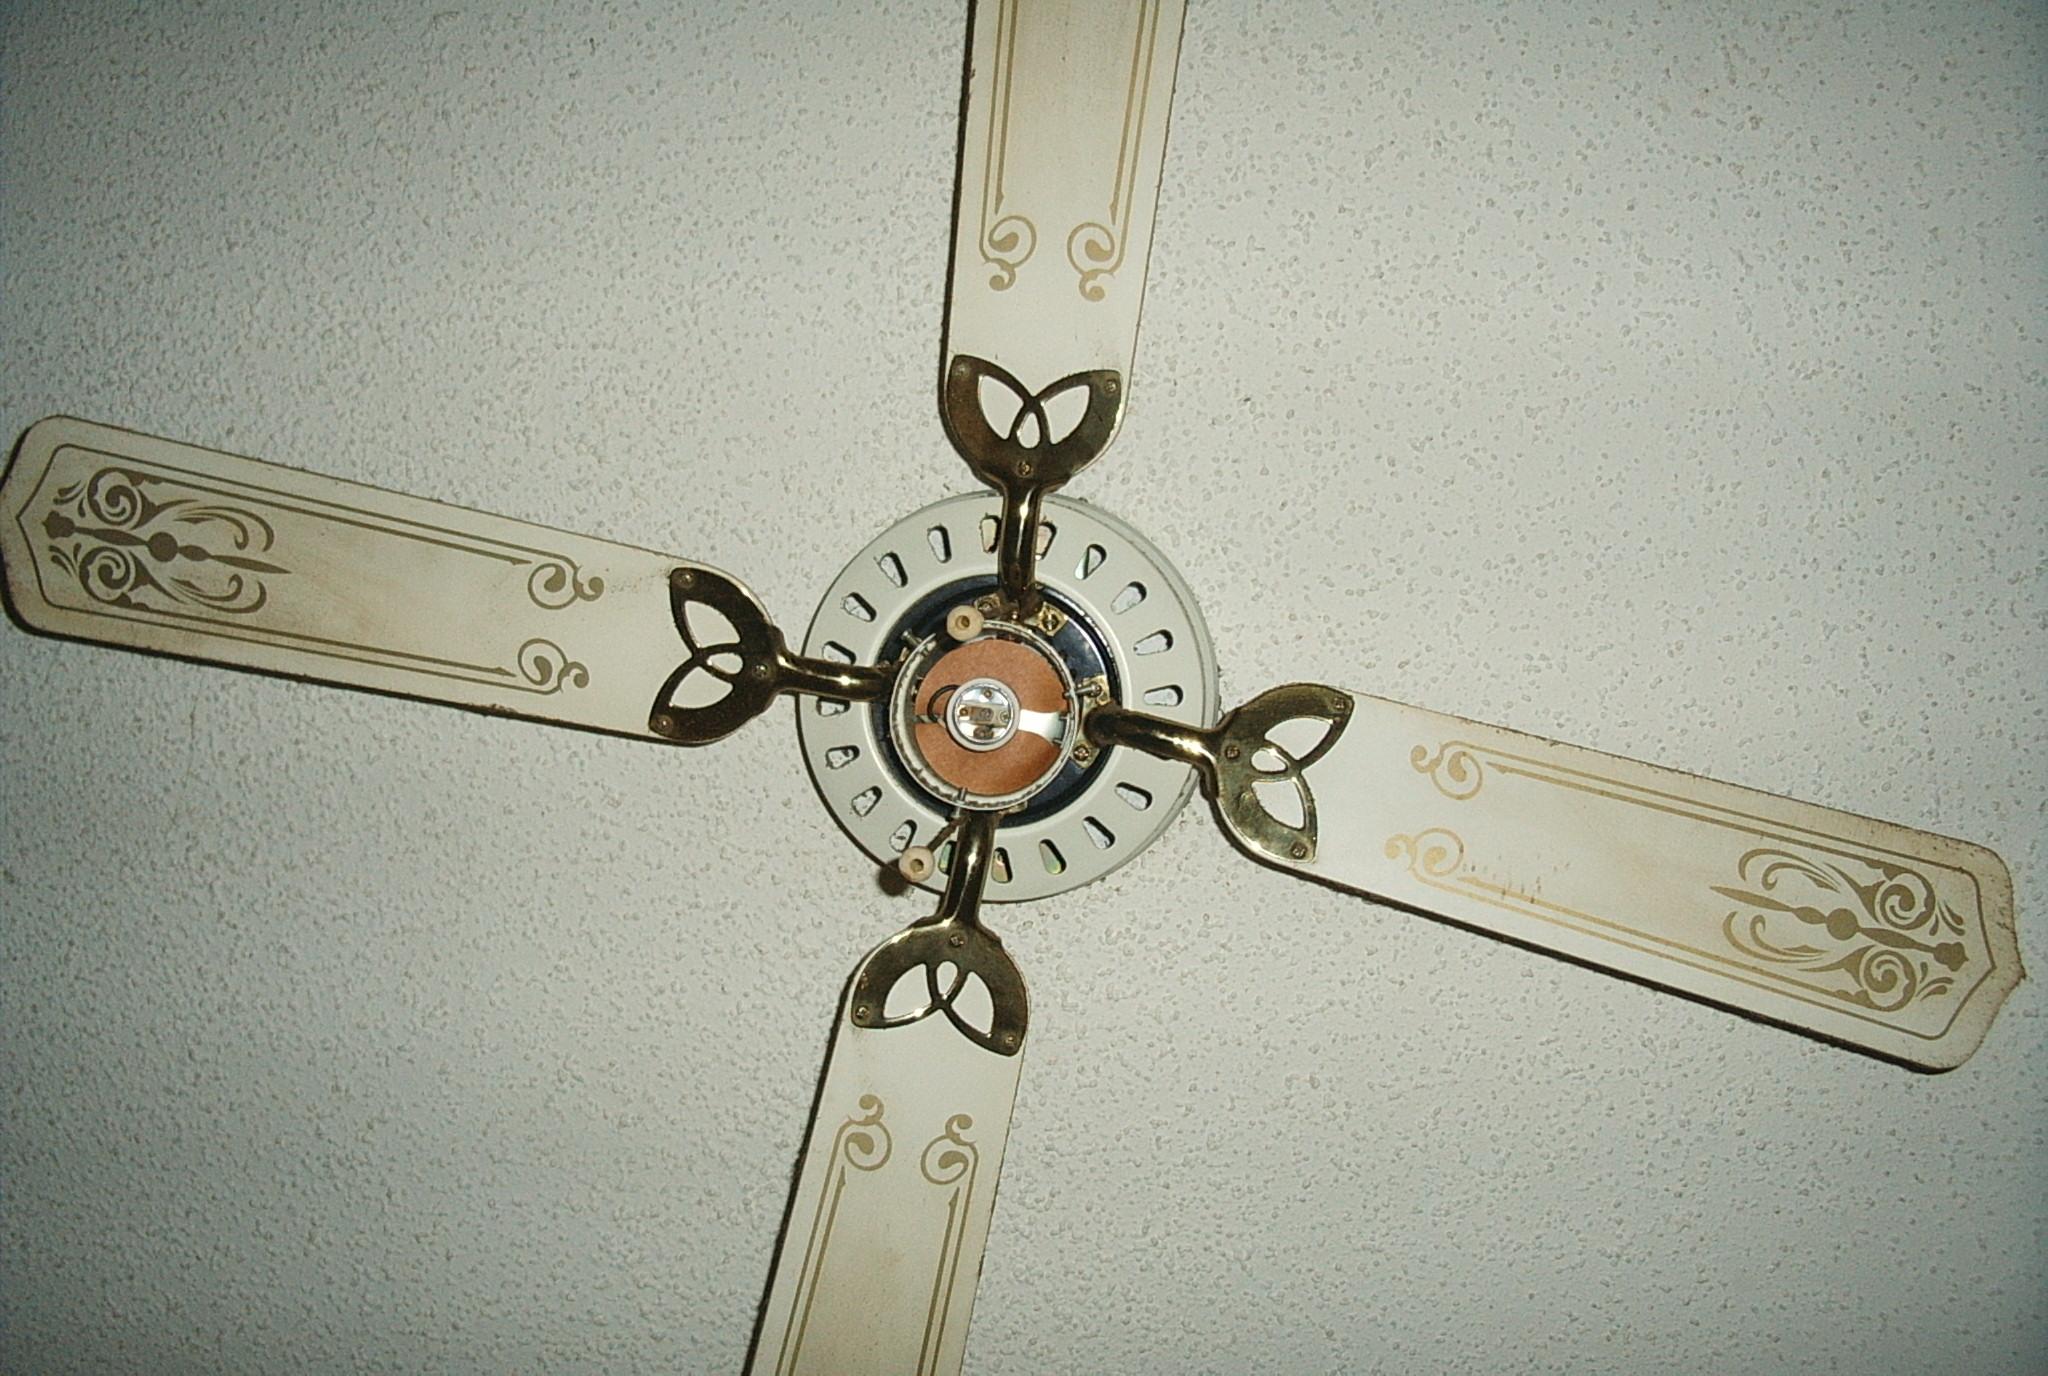 Filea ceiling fang wikimedia commons filea ceiling fang aloadofball Choice Image